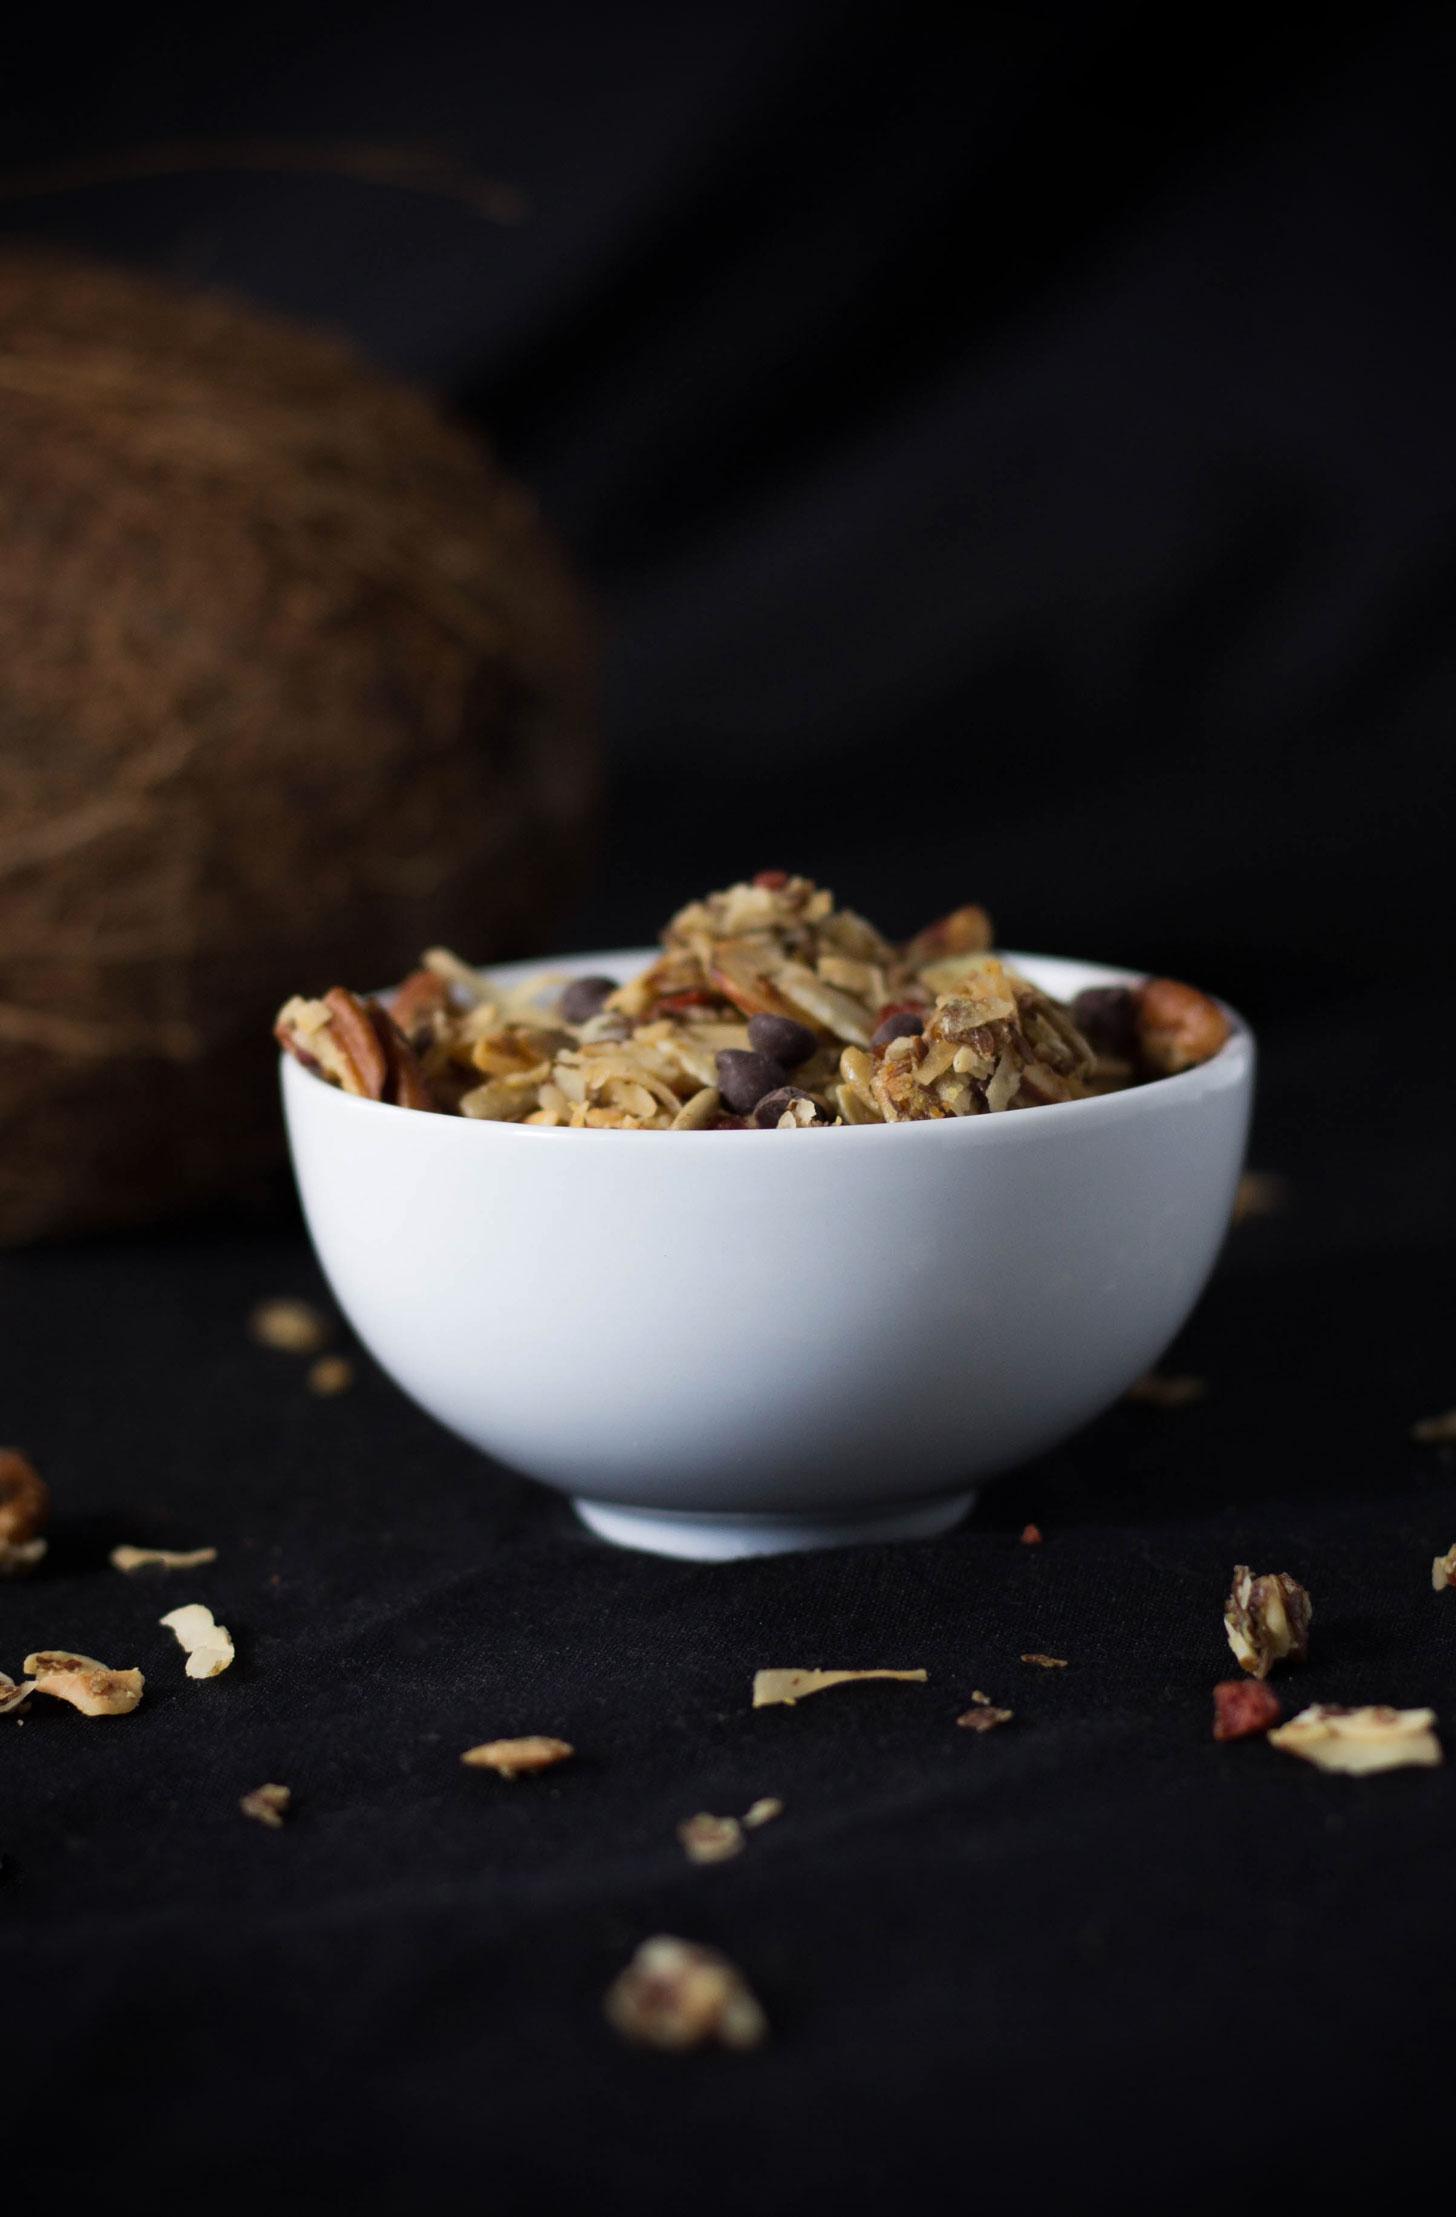 Vegan Maple Bacon Chocolate Granola! Sweet and smoky! #vegan #glutenfree #plantbased #granola #backpacking #recipe